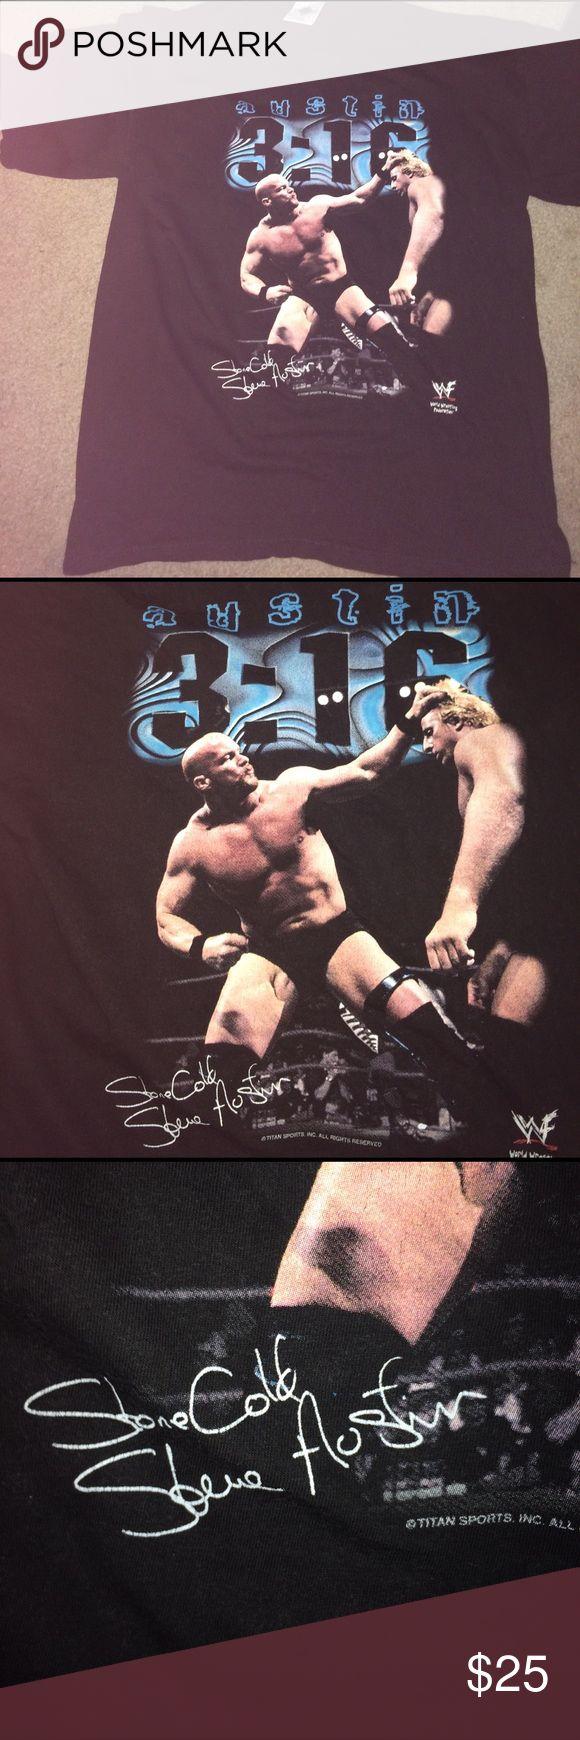 Men's Autographed Stone Cold Steve Austin Size L Men's Autographed Stone Cold Steve Austin Wrestling T Shirt Perfect Condition!! Tour Champ Shirts Tees - Short Sleeve